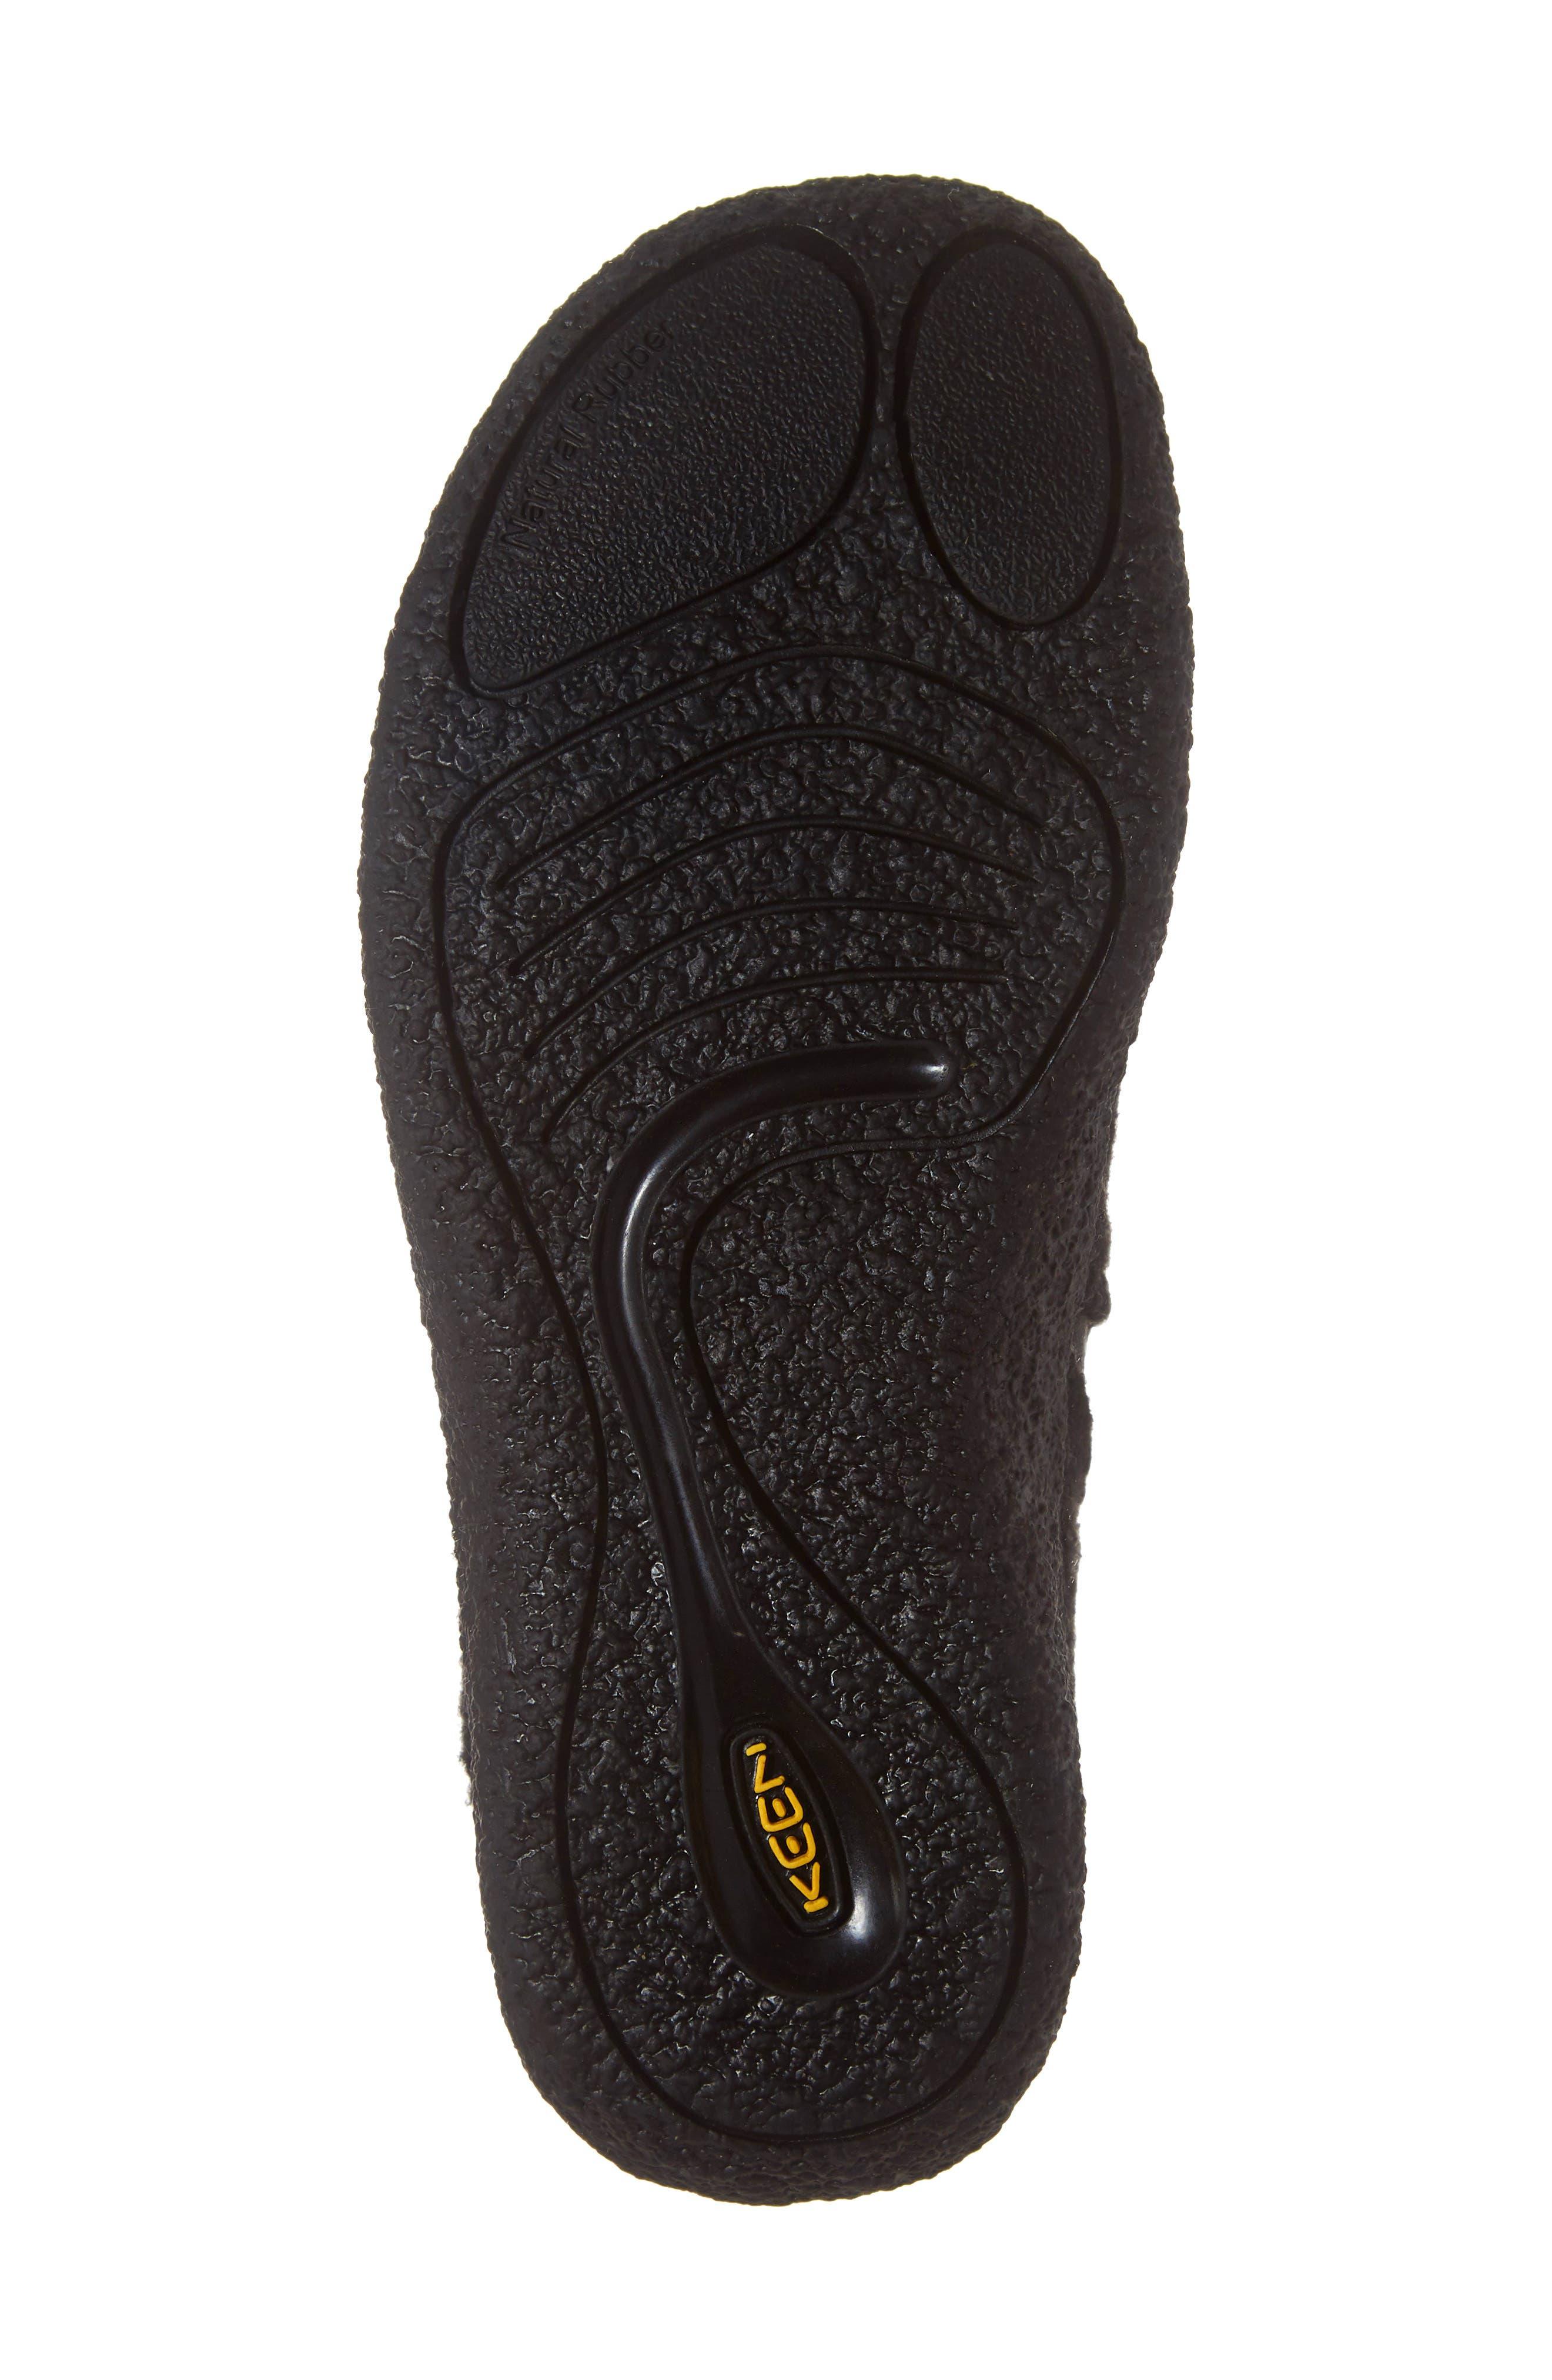 Howser Round Toe Wool Slip-on,                             Alternate thumbnail 6, color,                             BLACK KNOBBY/ STEEL GREY WOOL